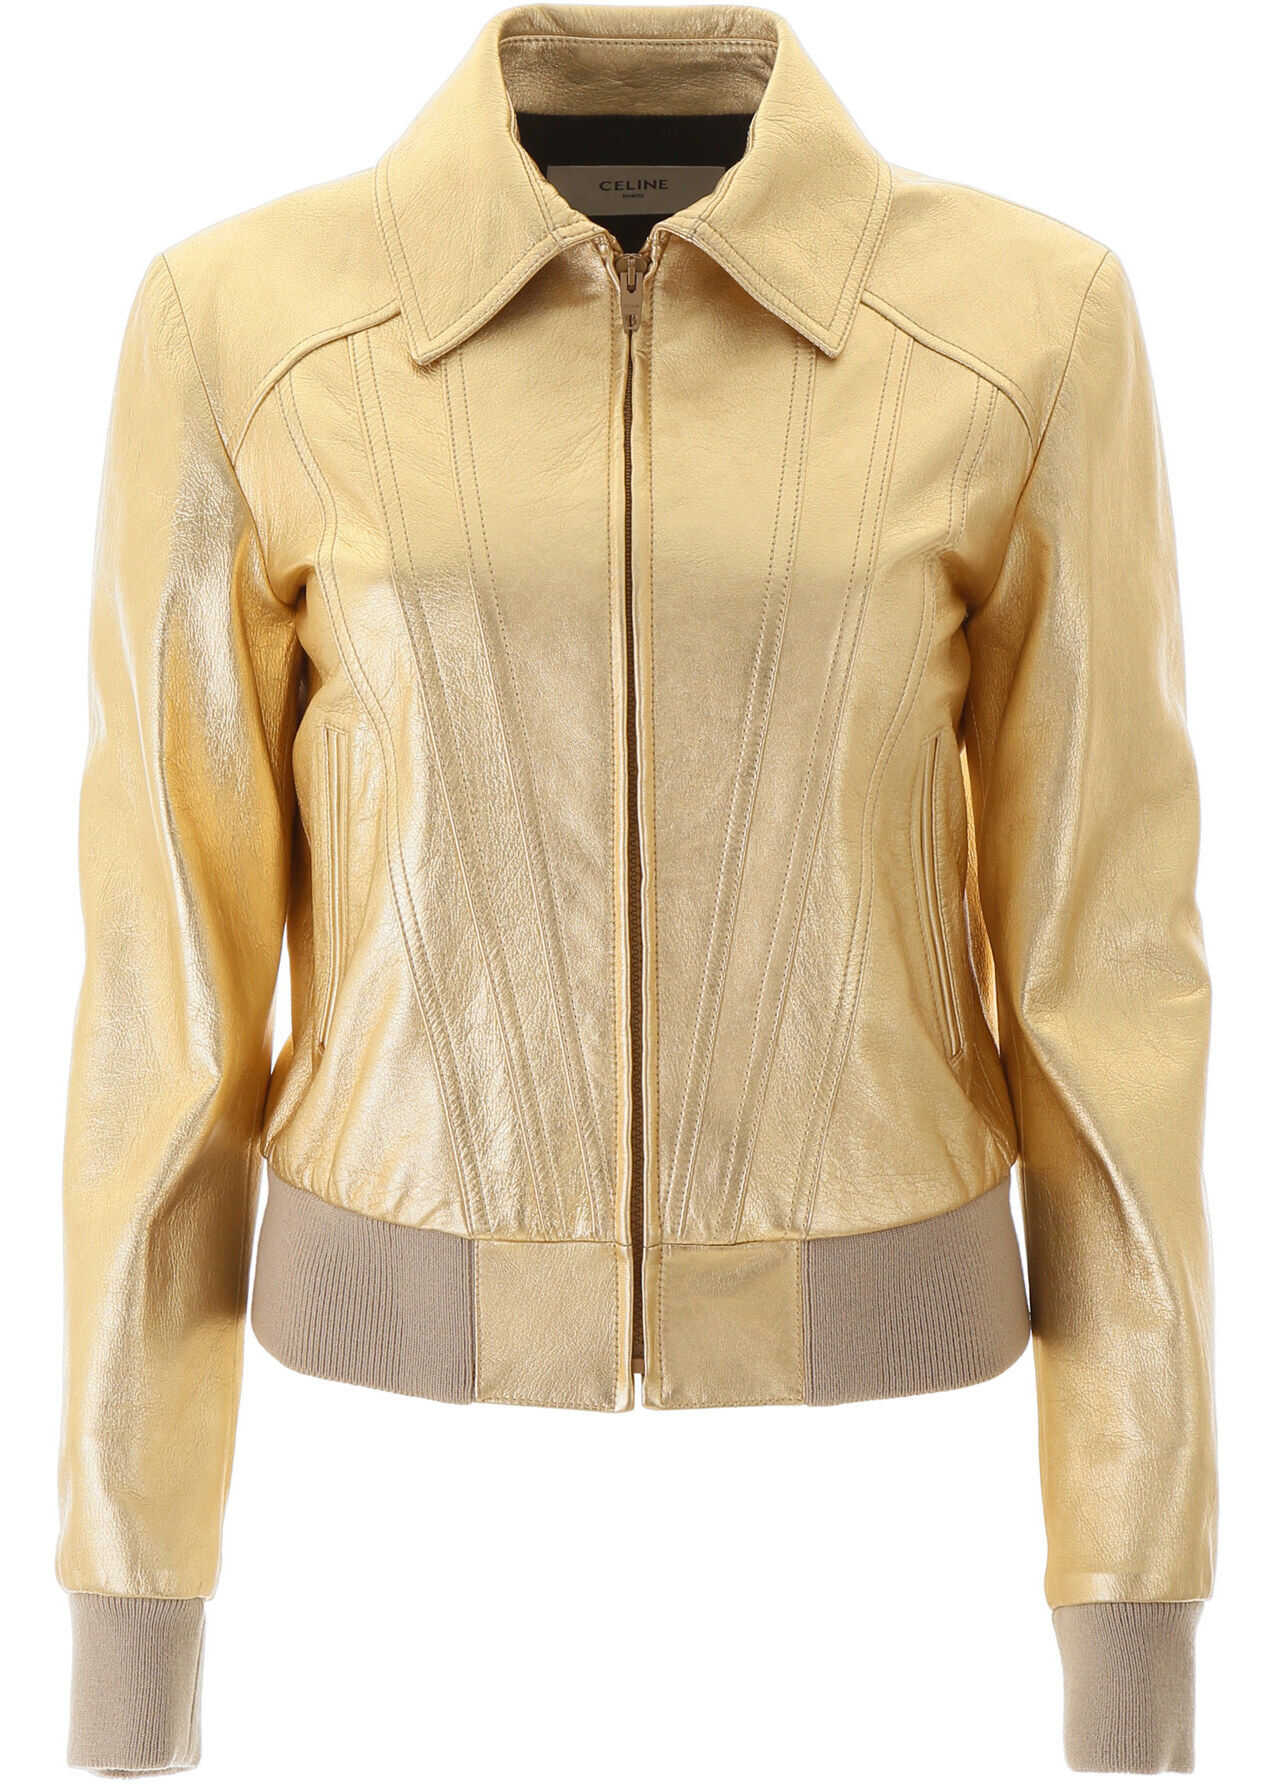 Céline Laminated Leather Jacket GOLD